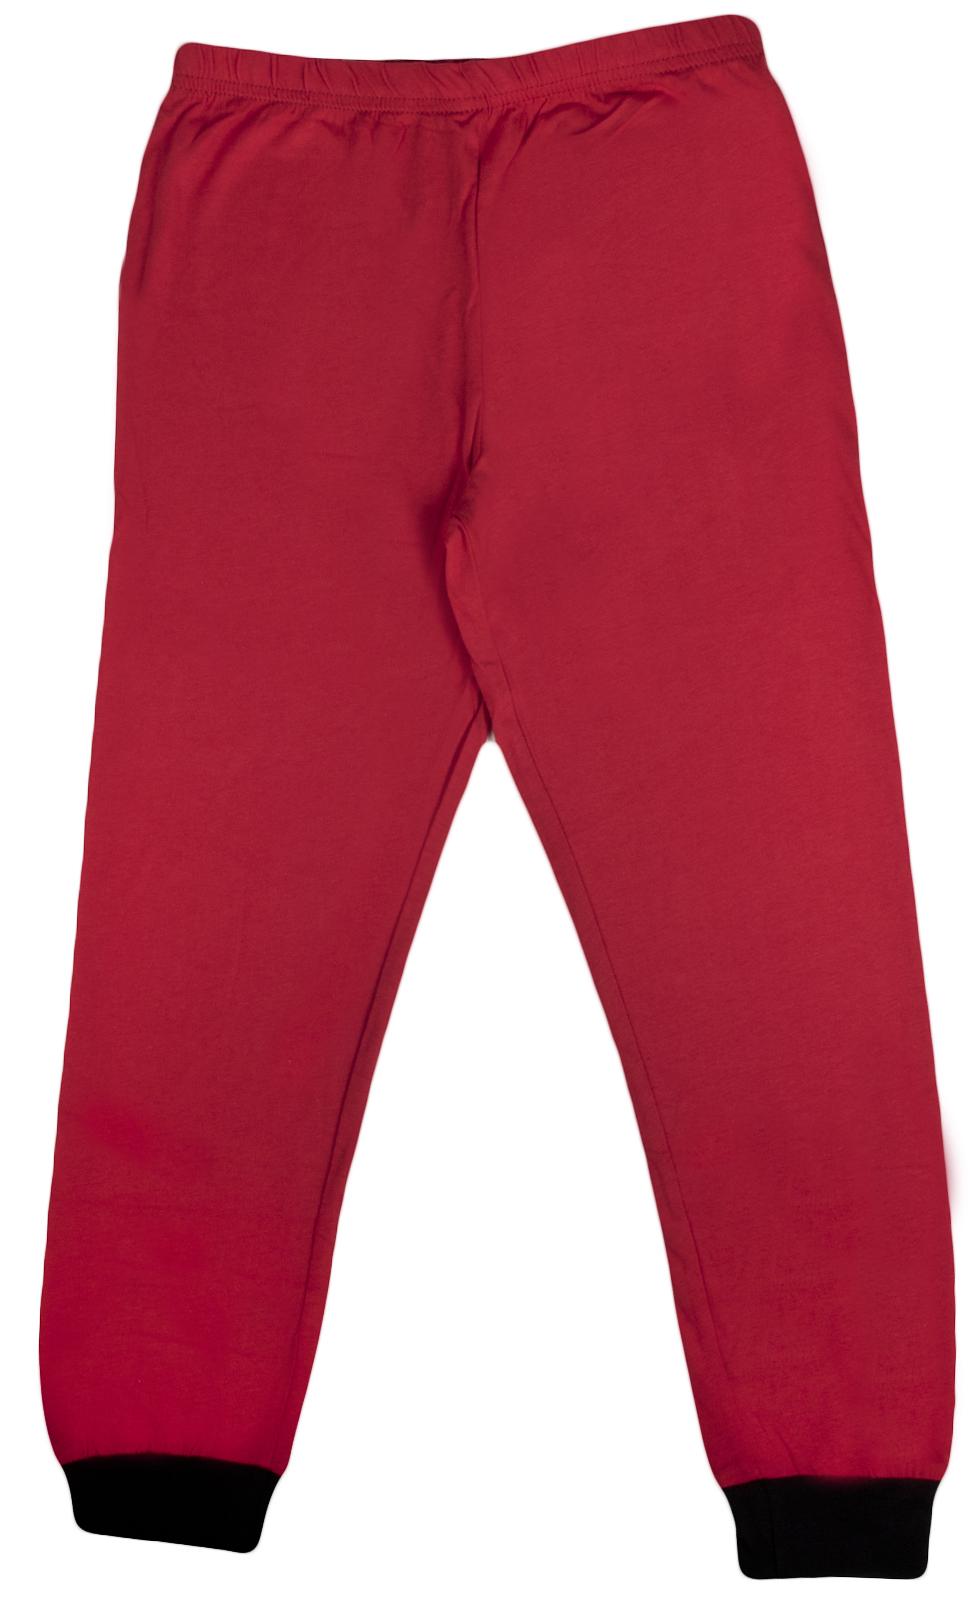 Boys Official Football Pyjamas Full Length Premiership Footie PJs Kids Gift Size